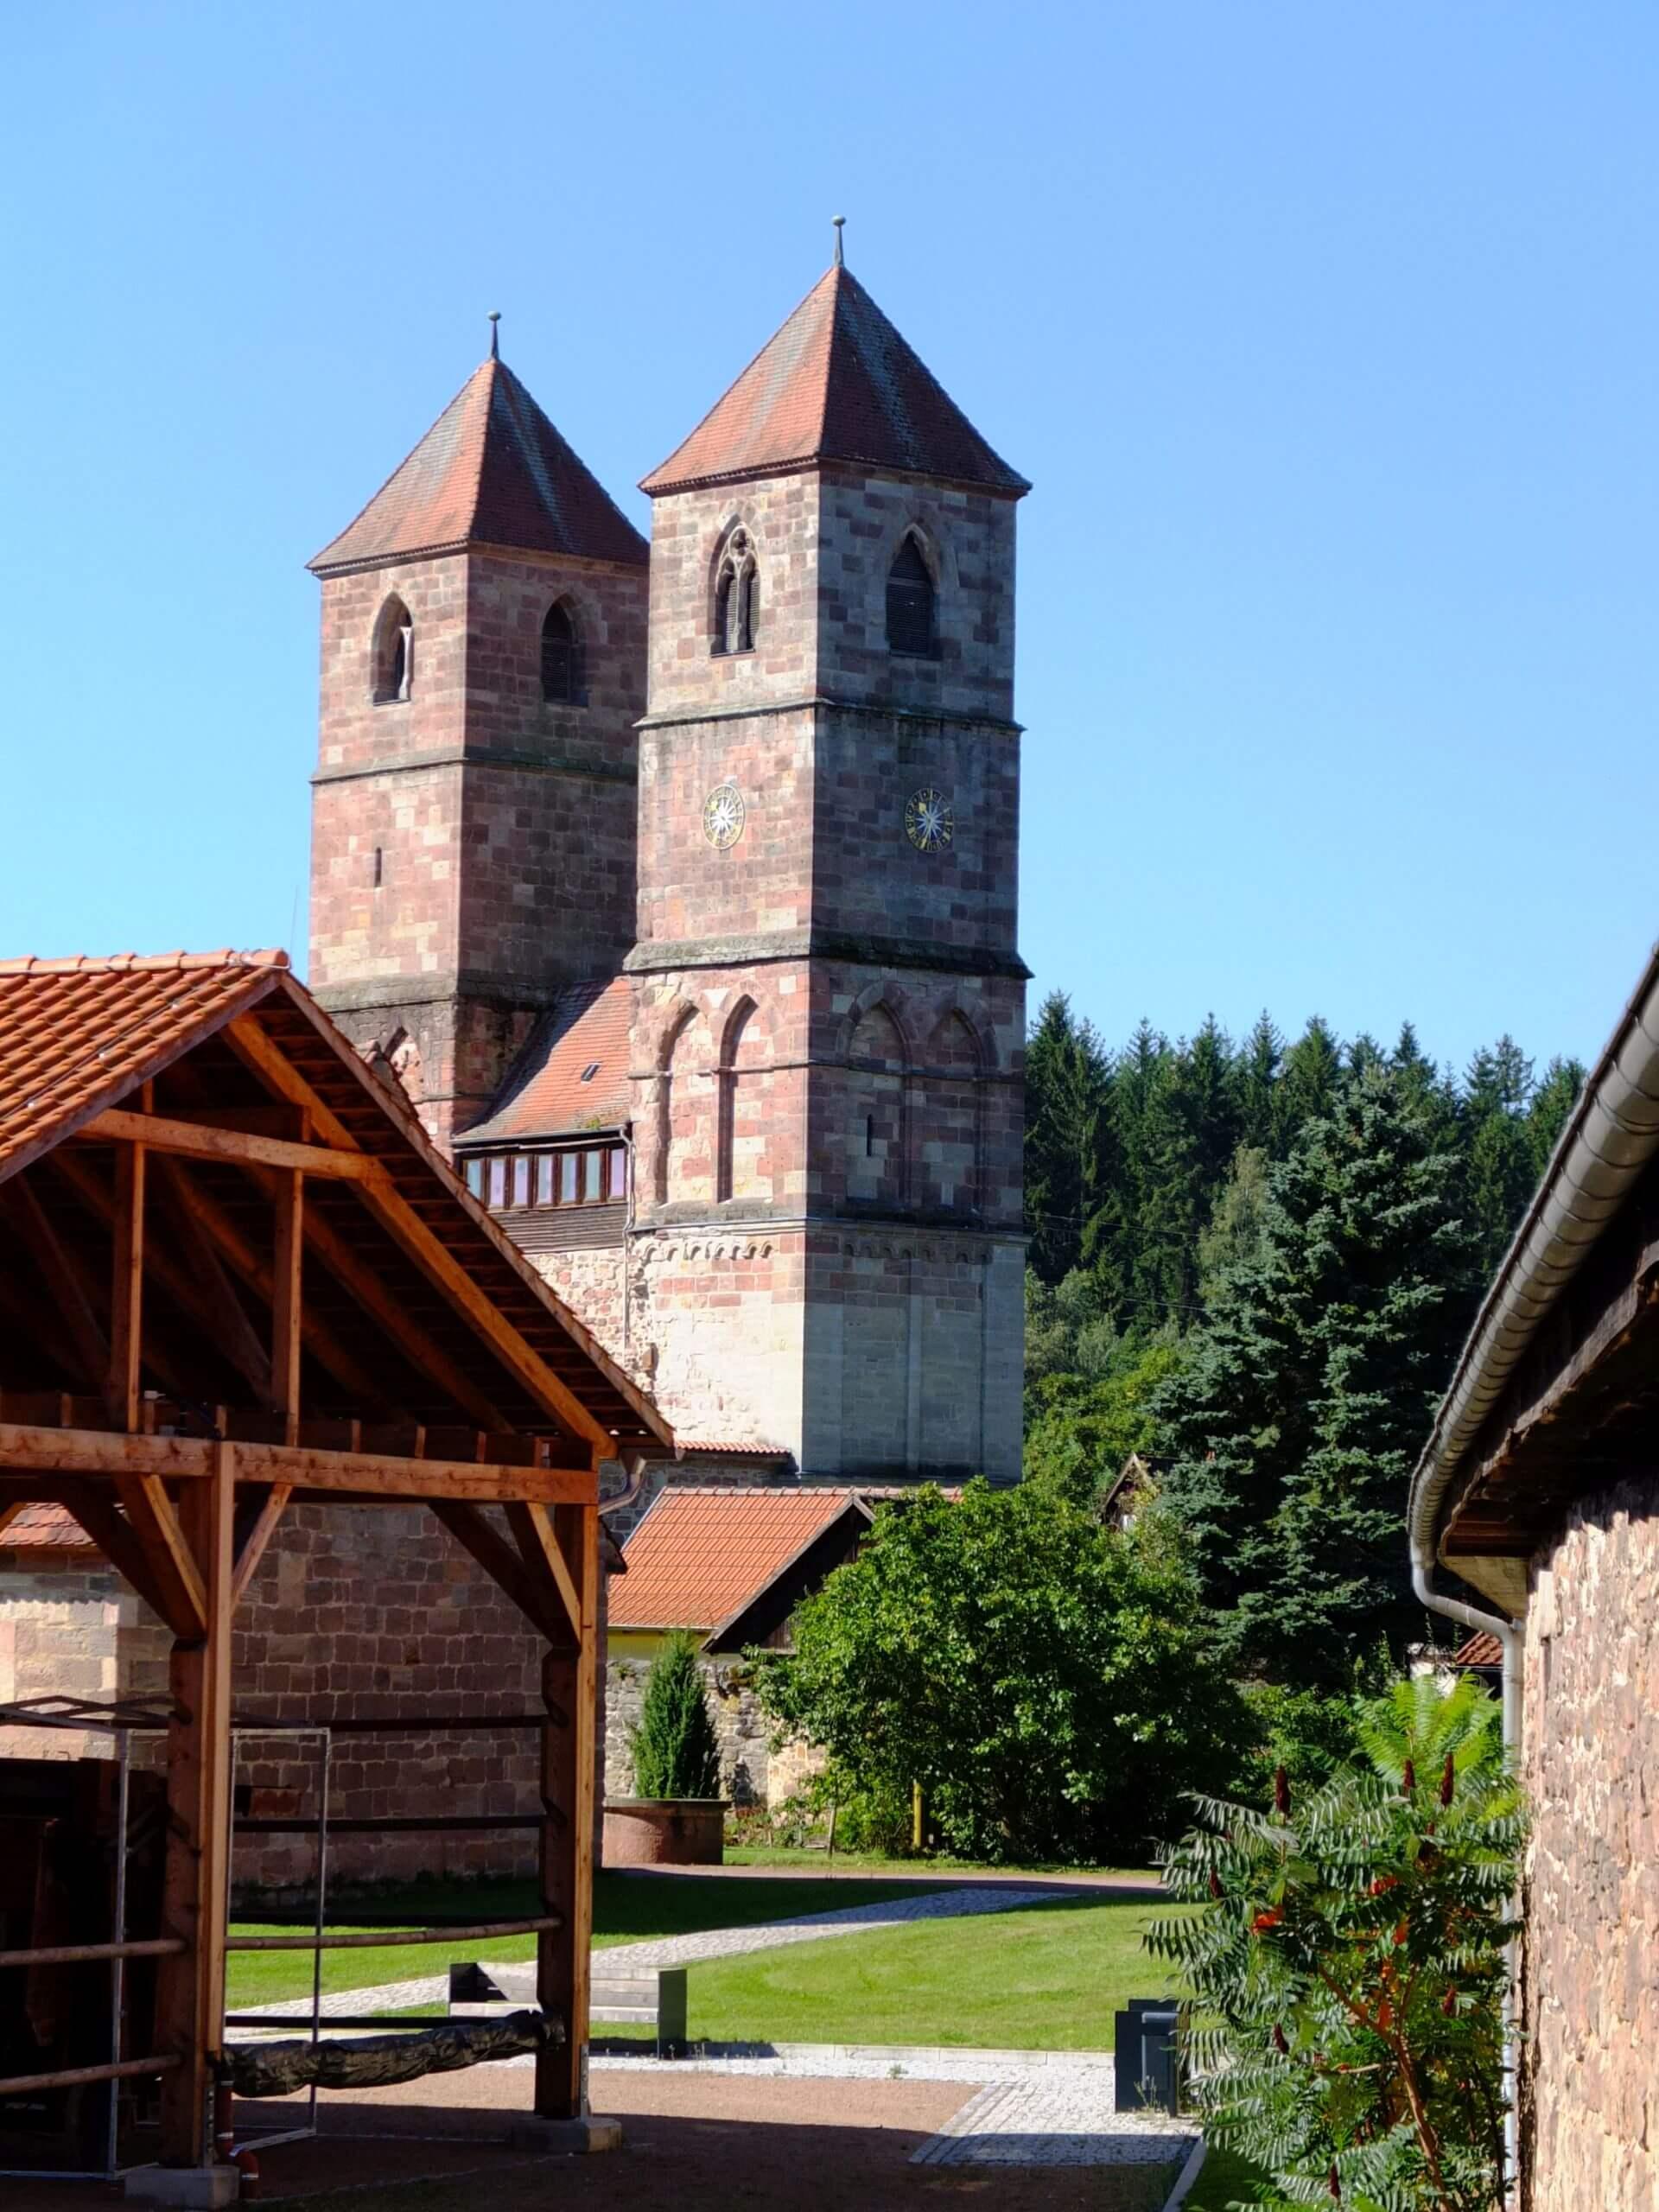 Die Türme des Kloster Veßra in Thüringen